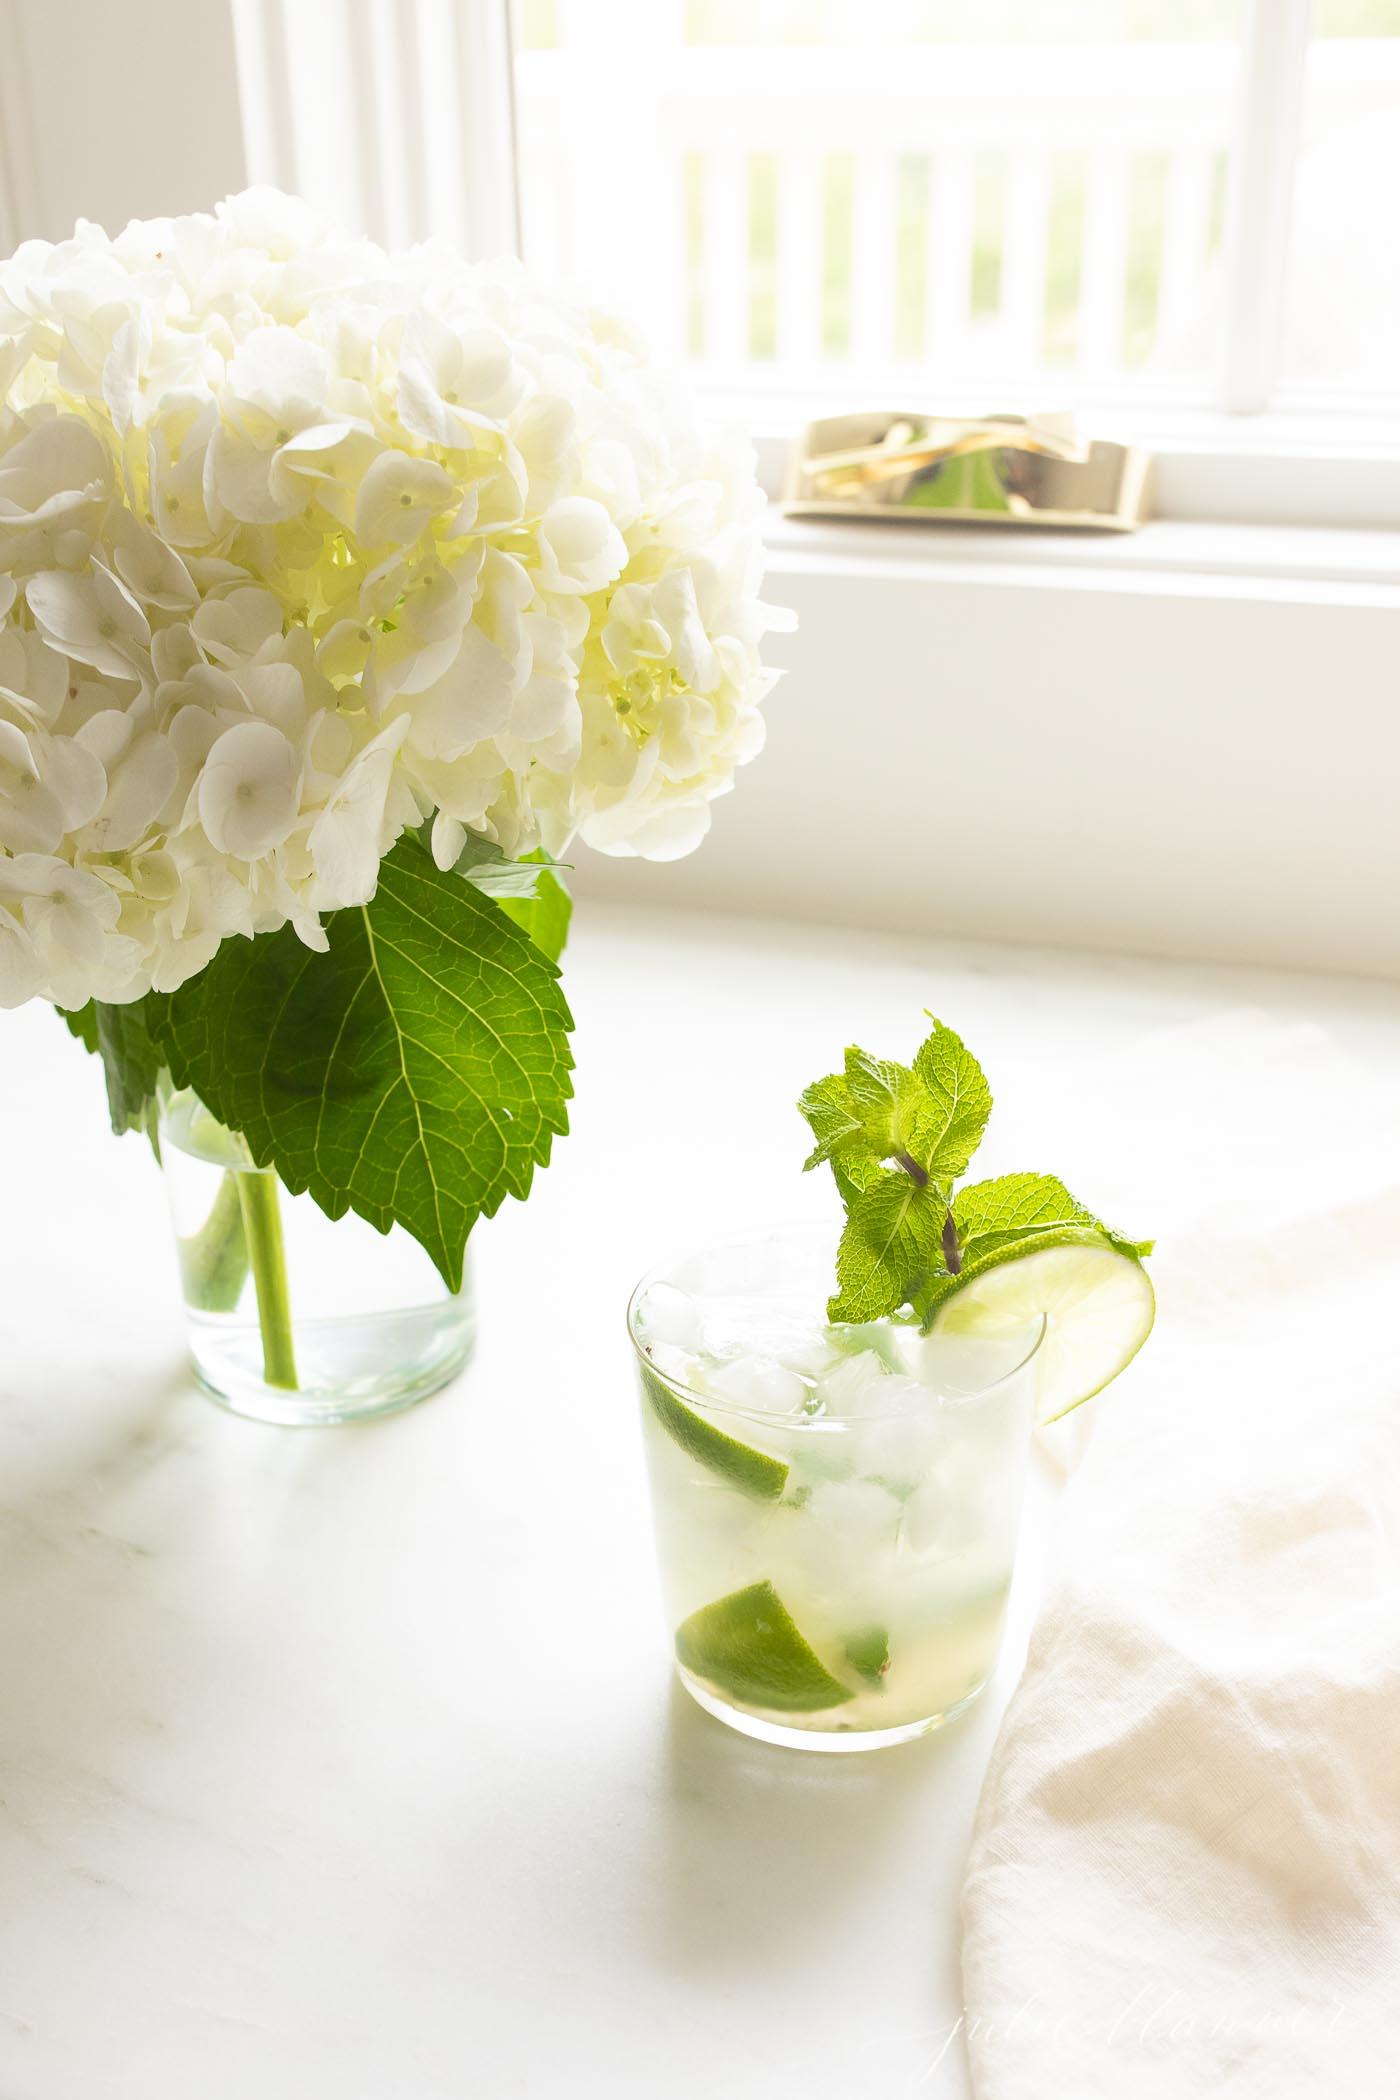 skinny mojito next to a vase of hydrangea